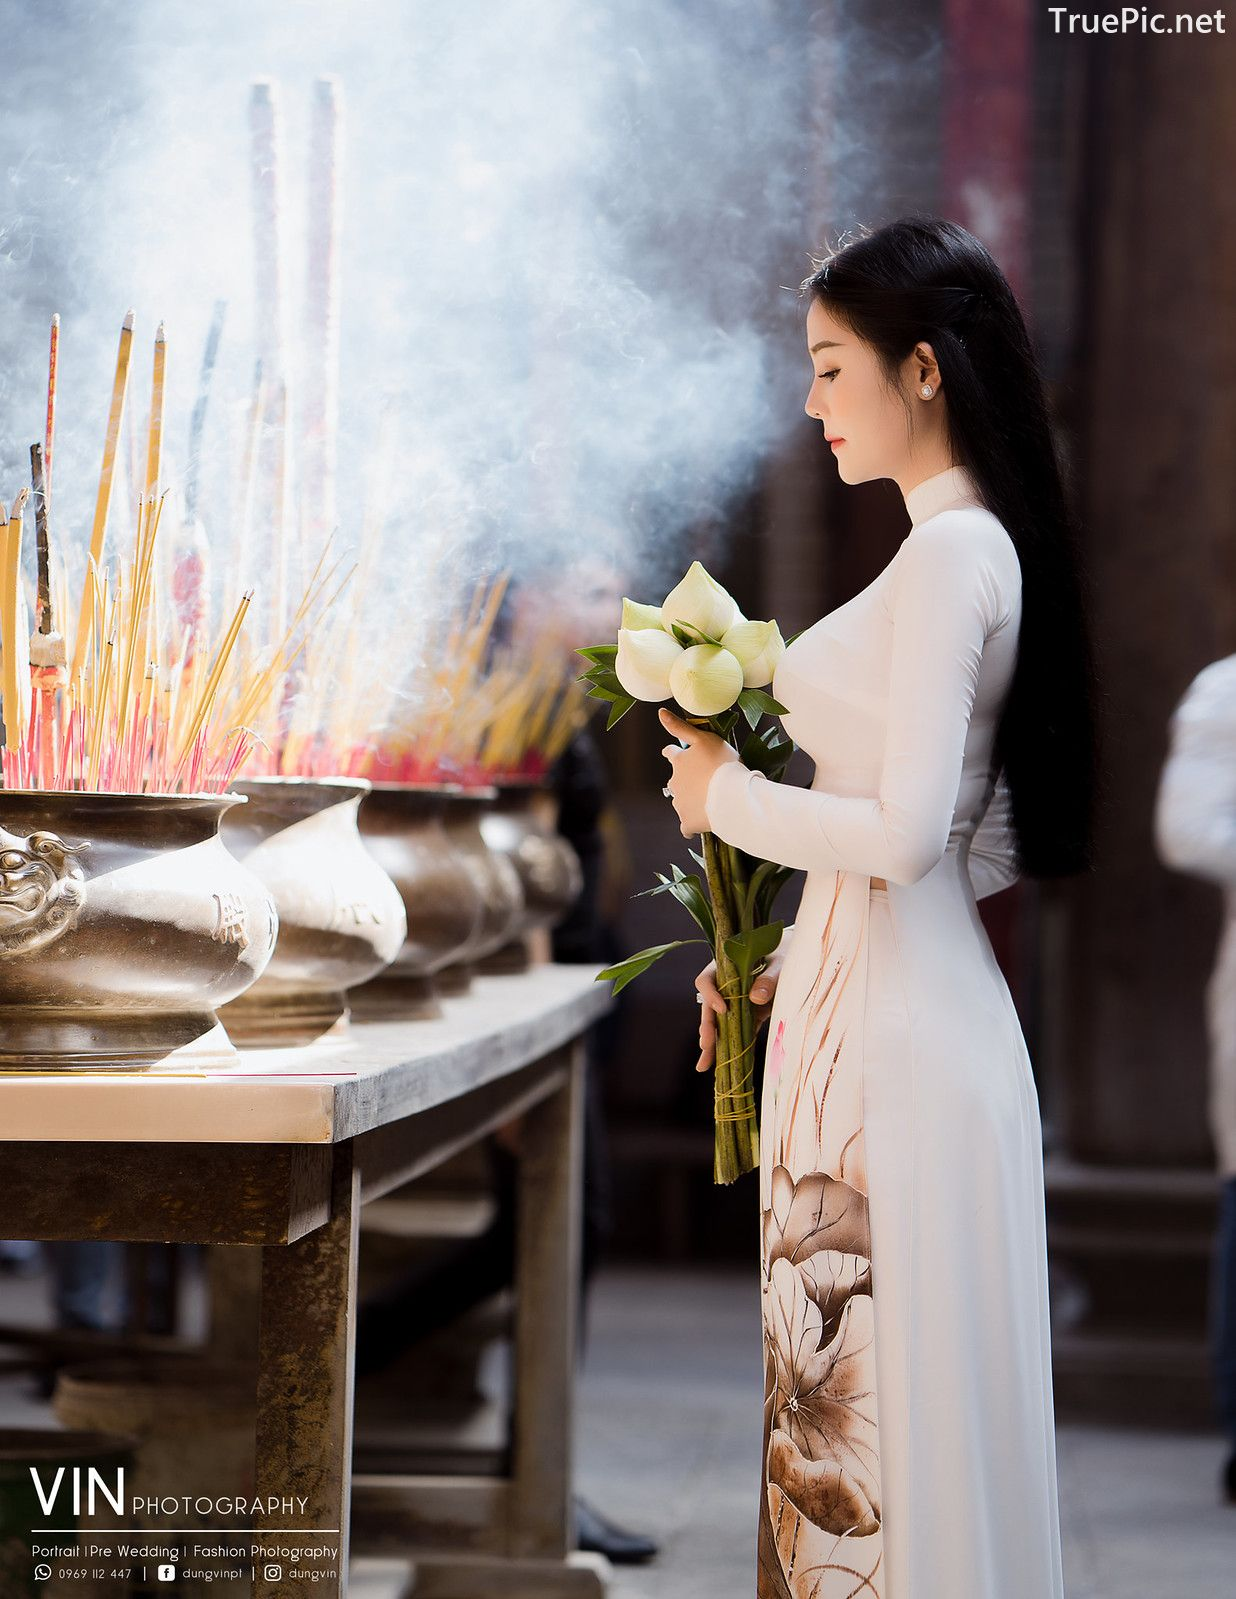 Image-Vietnamese-Beautiful-Girl-Ao-Dai-Vietnam-Traditional-Dress-by-VIN-Photo-1-TruePic.net- Picture-2